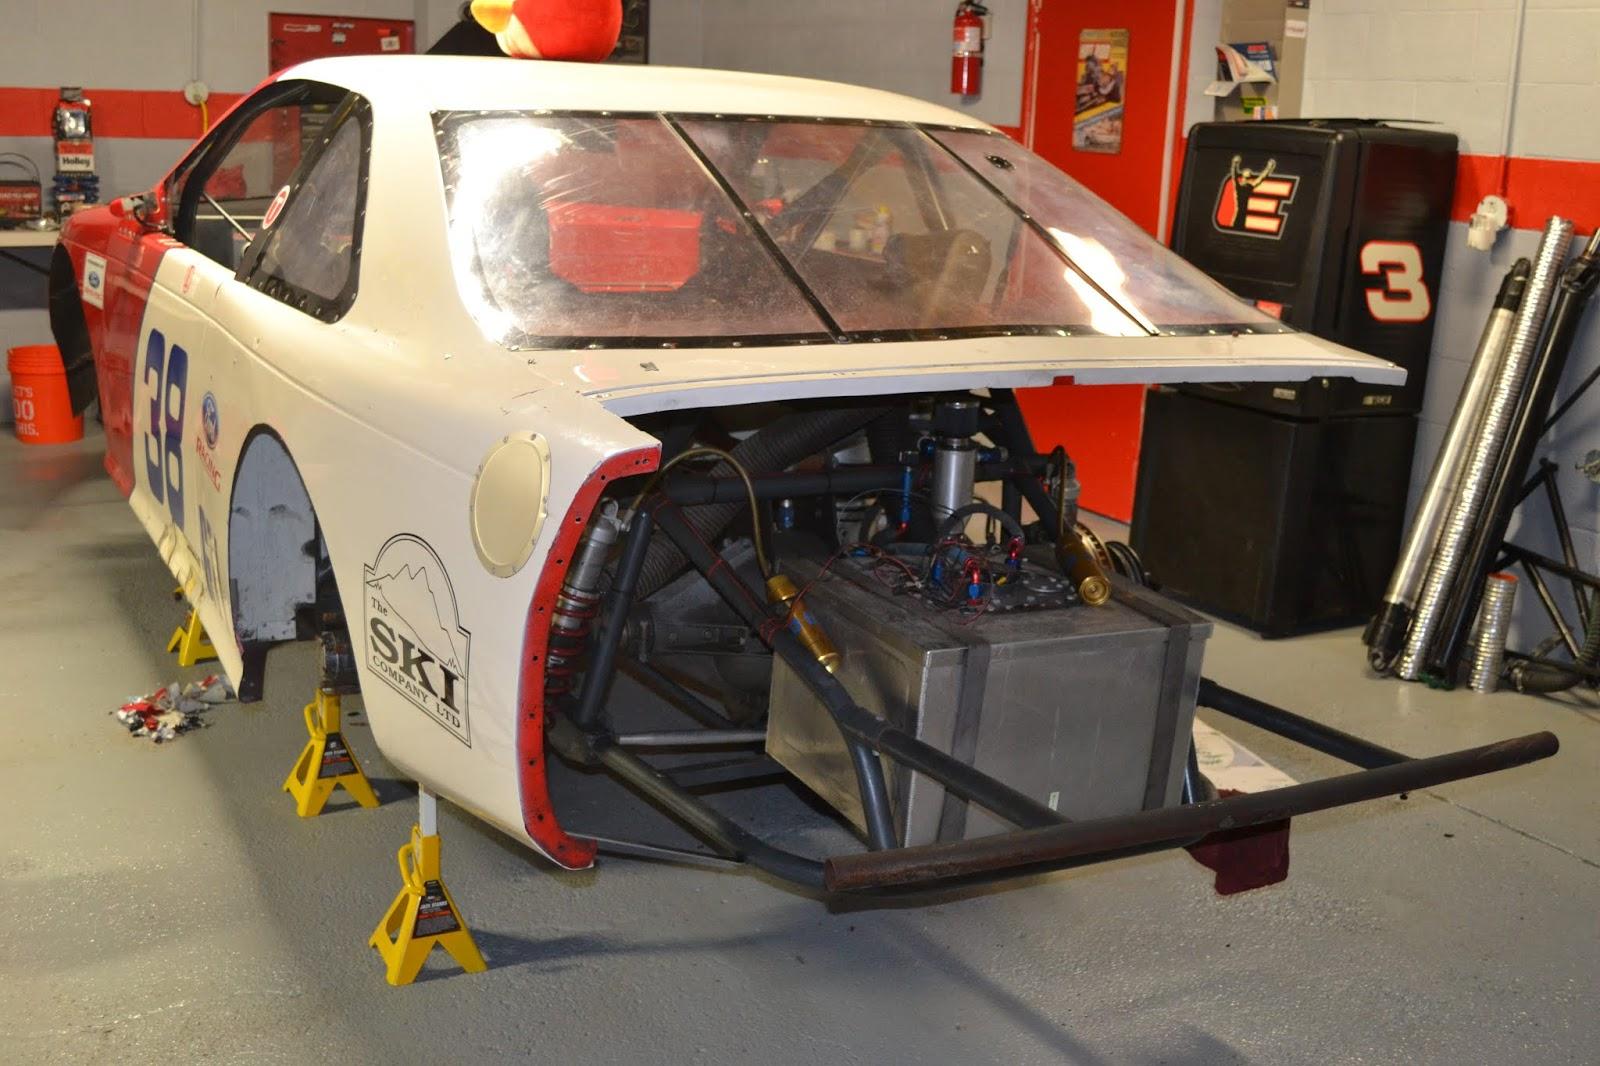 Camaro GT-2, GTA, TA-2 American Muscle Build Up